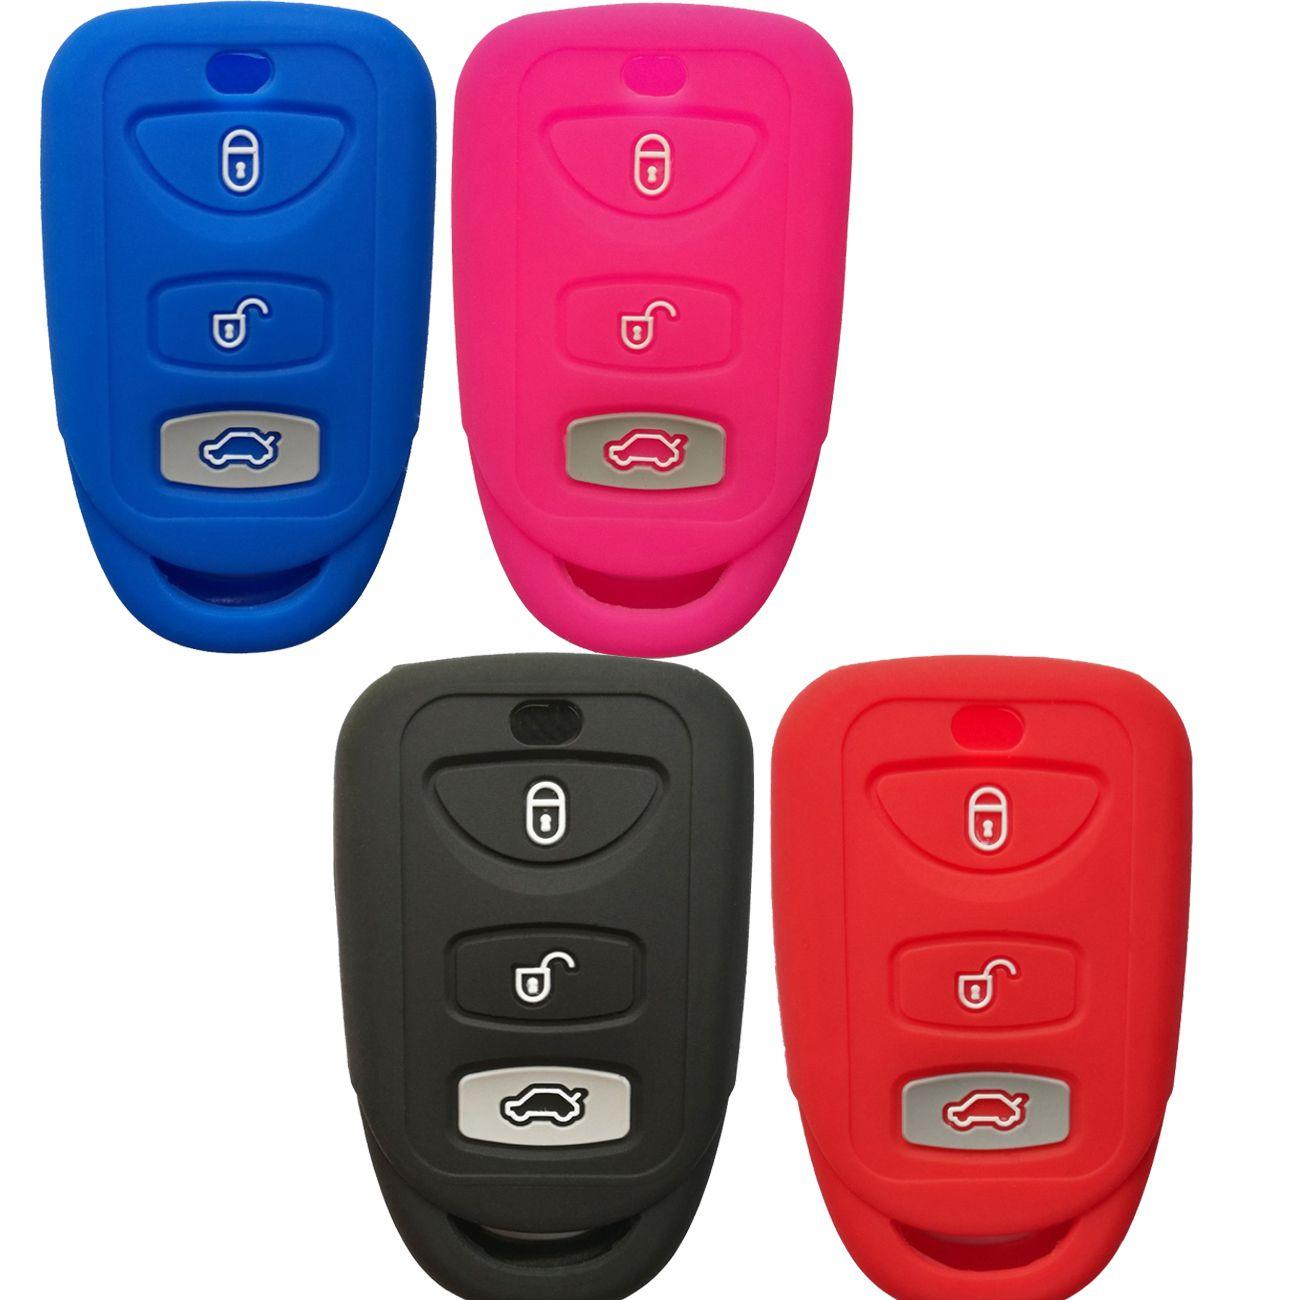 3buttons Key Fob Cover Case Keyless Entry Jacket Protector Holder For Hyundai Elantra Genesis Sonata Kia Sorento Forte Optima Rondo Spectra